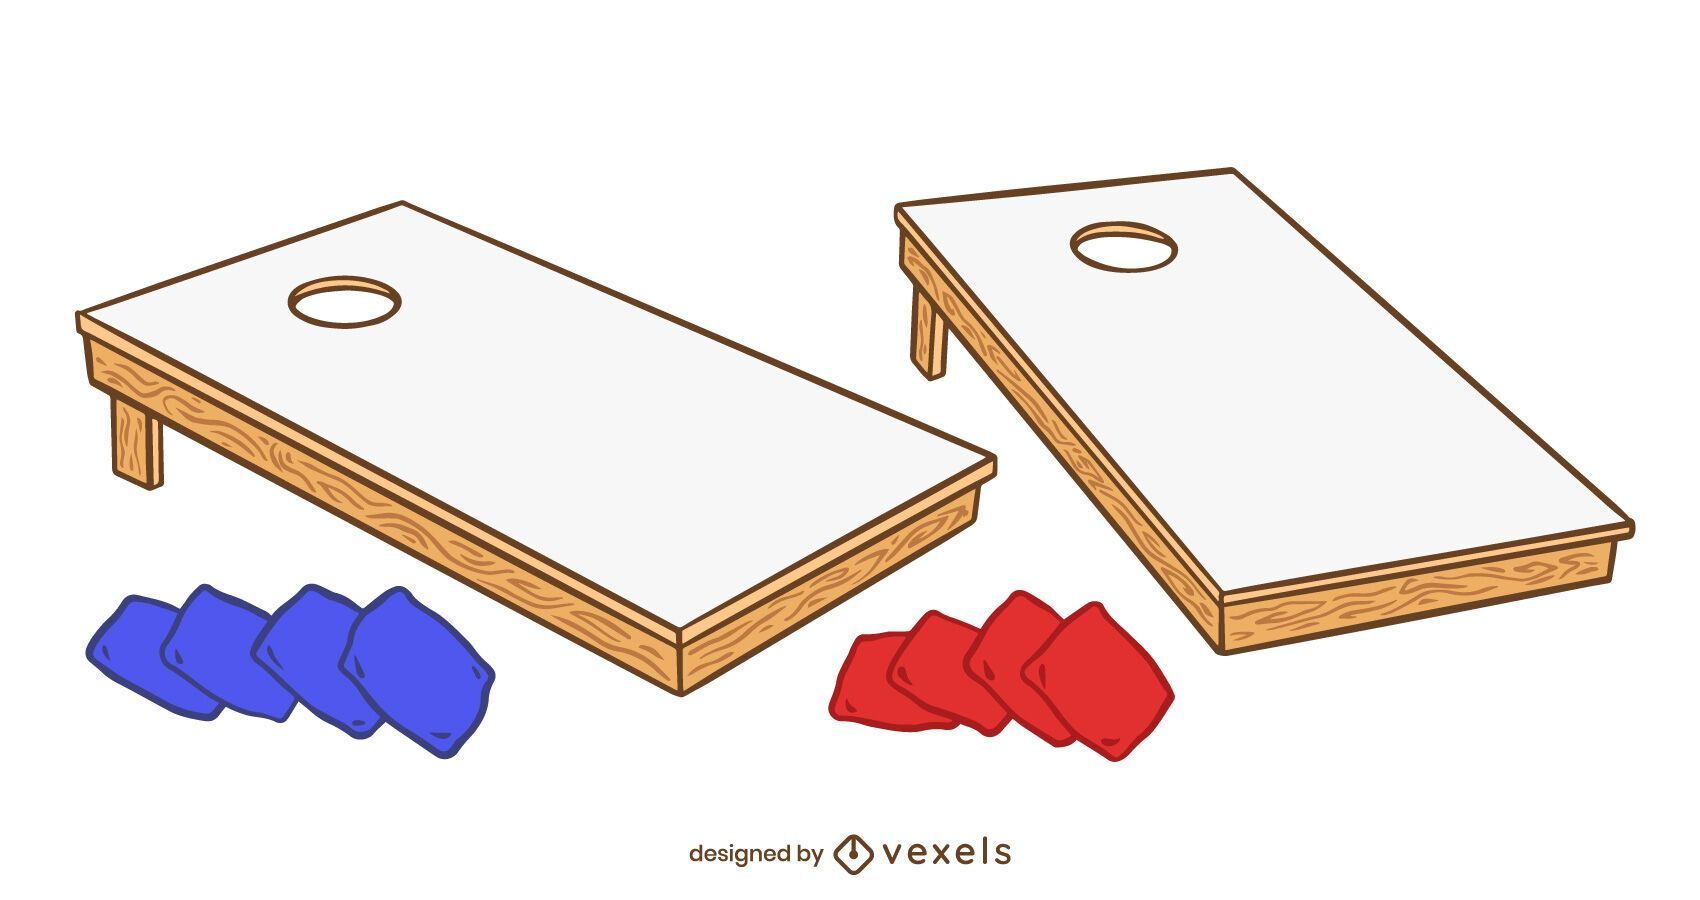 Cornhole elements set